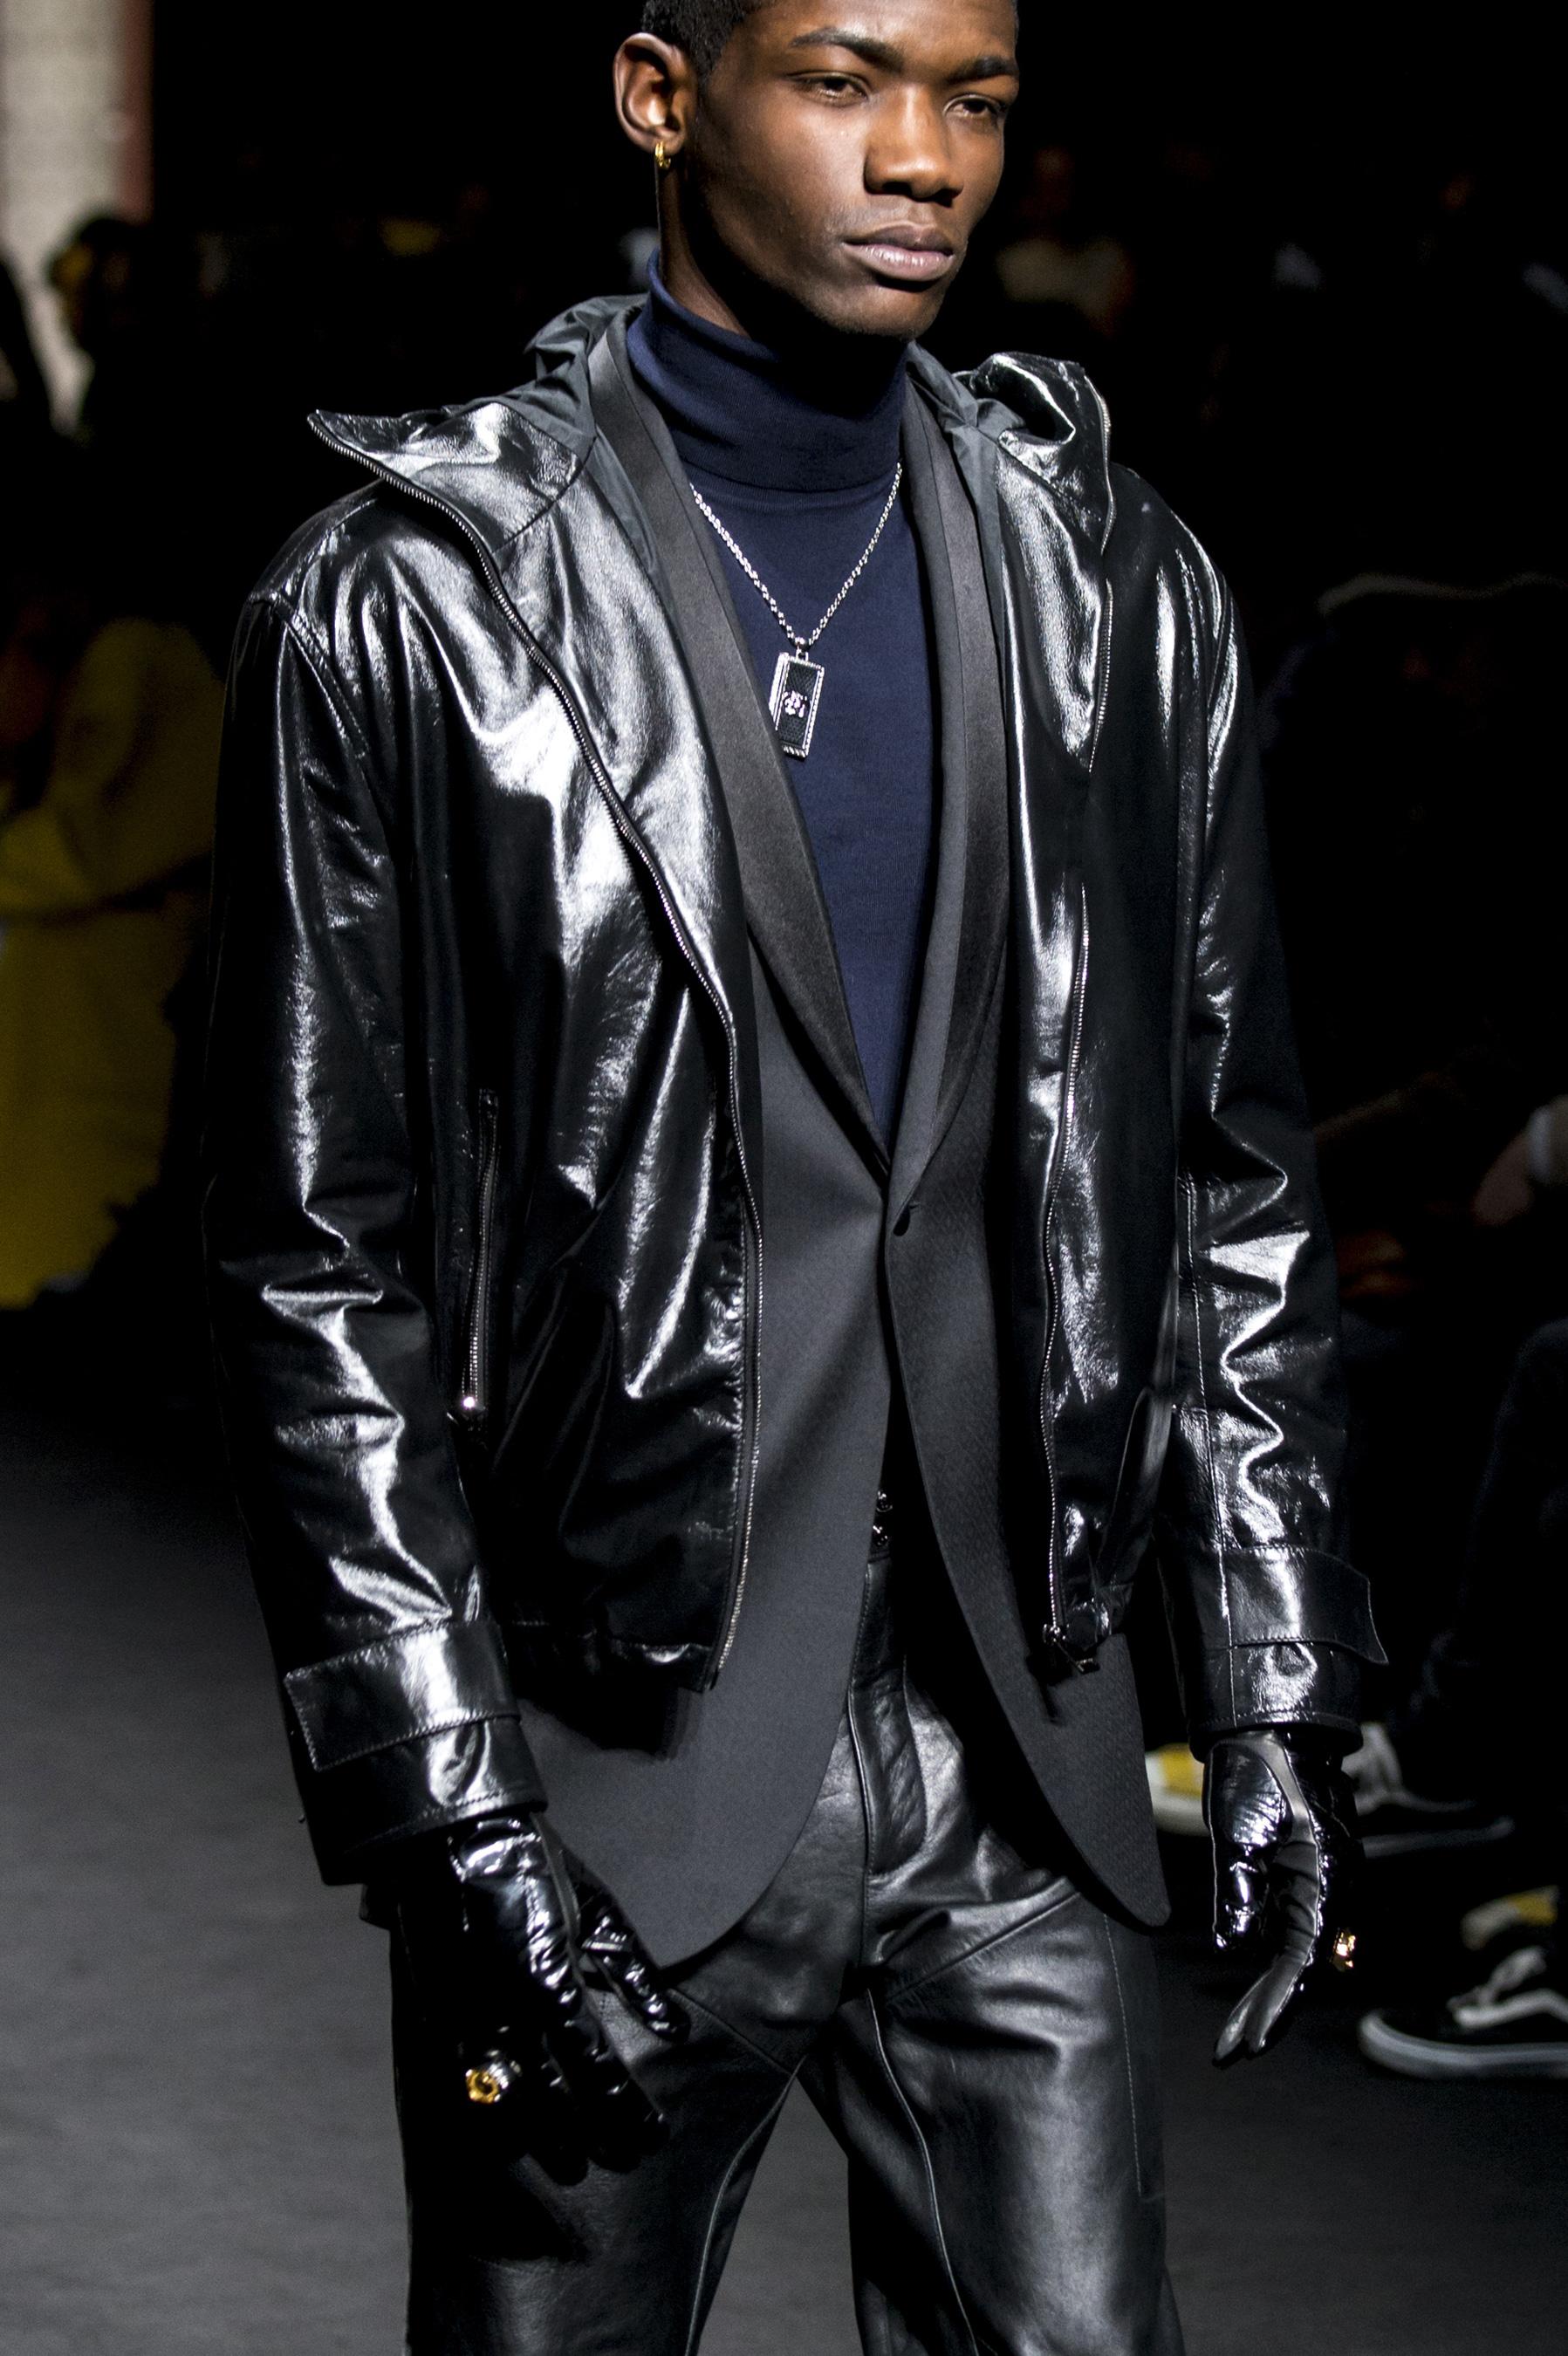 Versace m clp RF17 9900